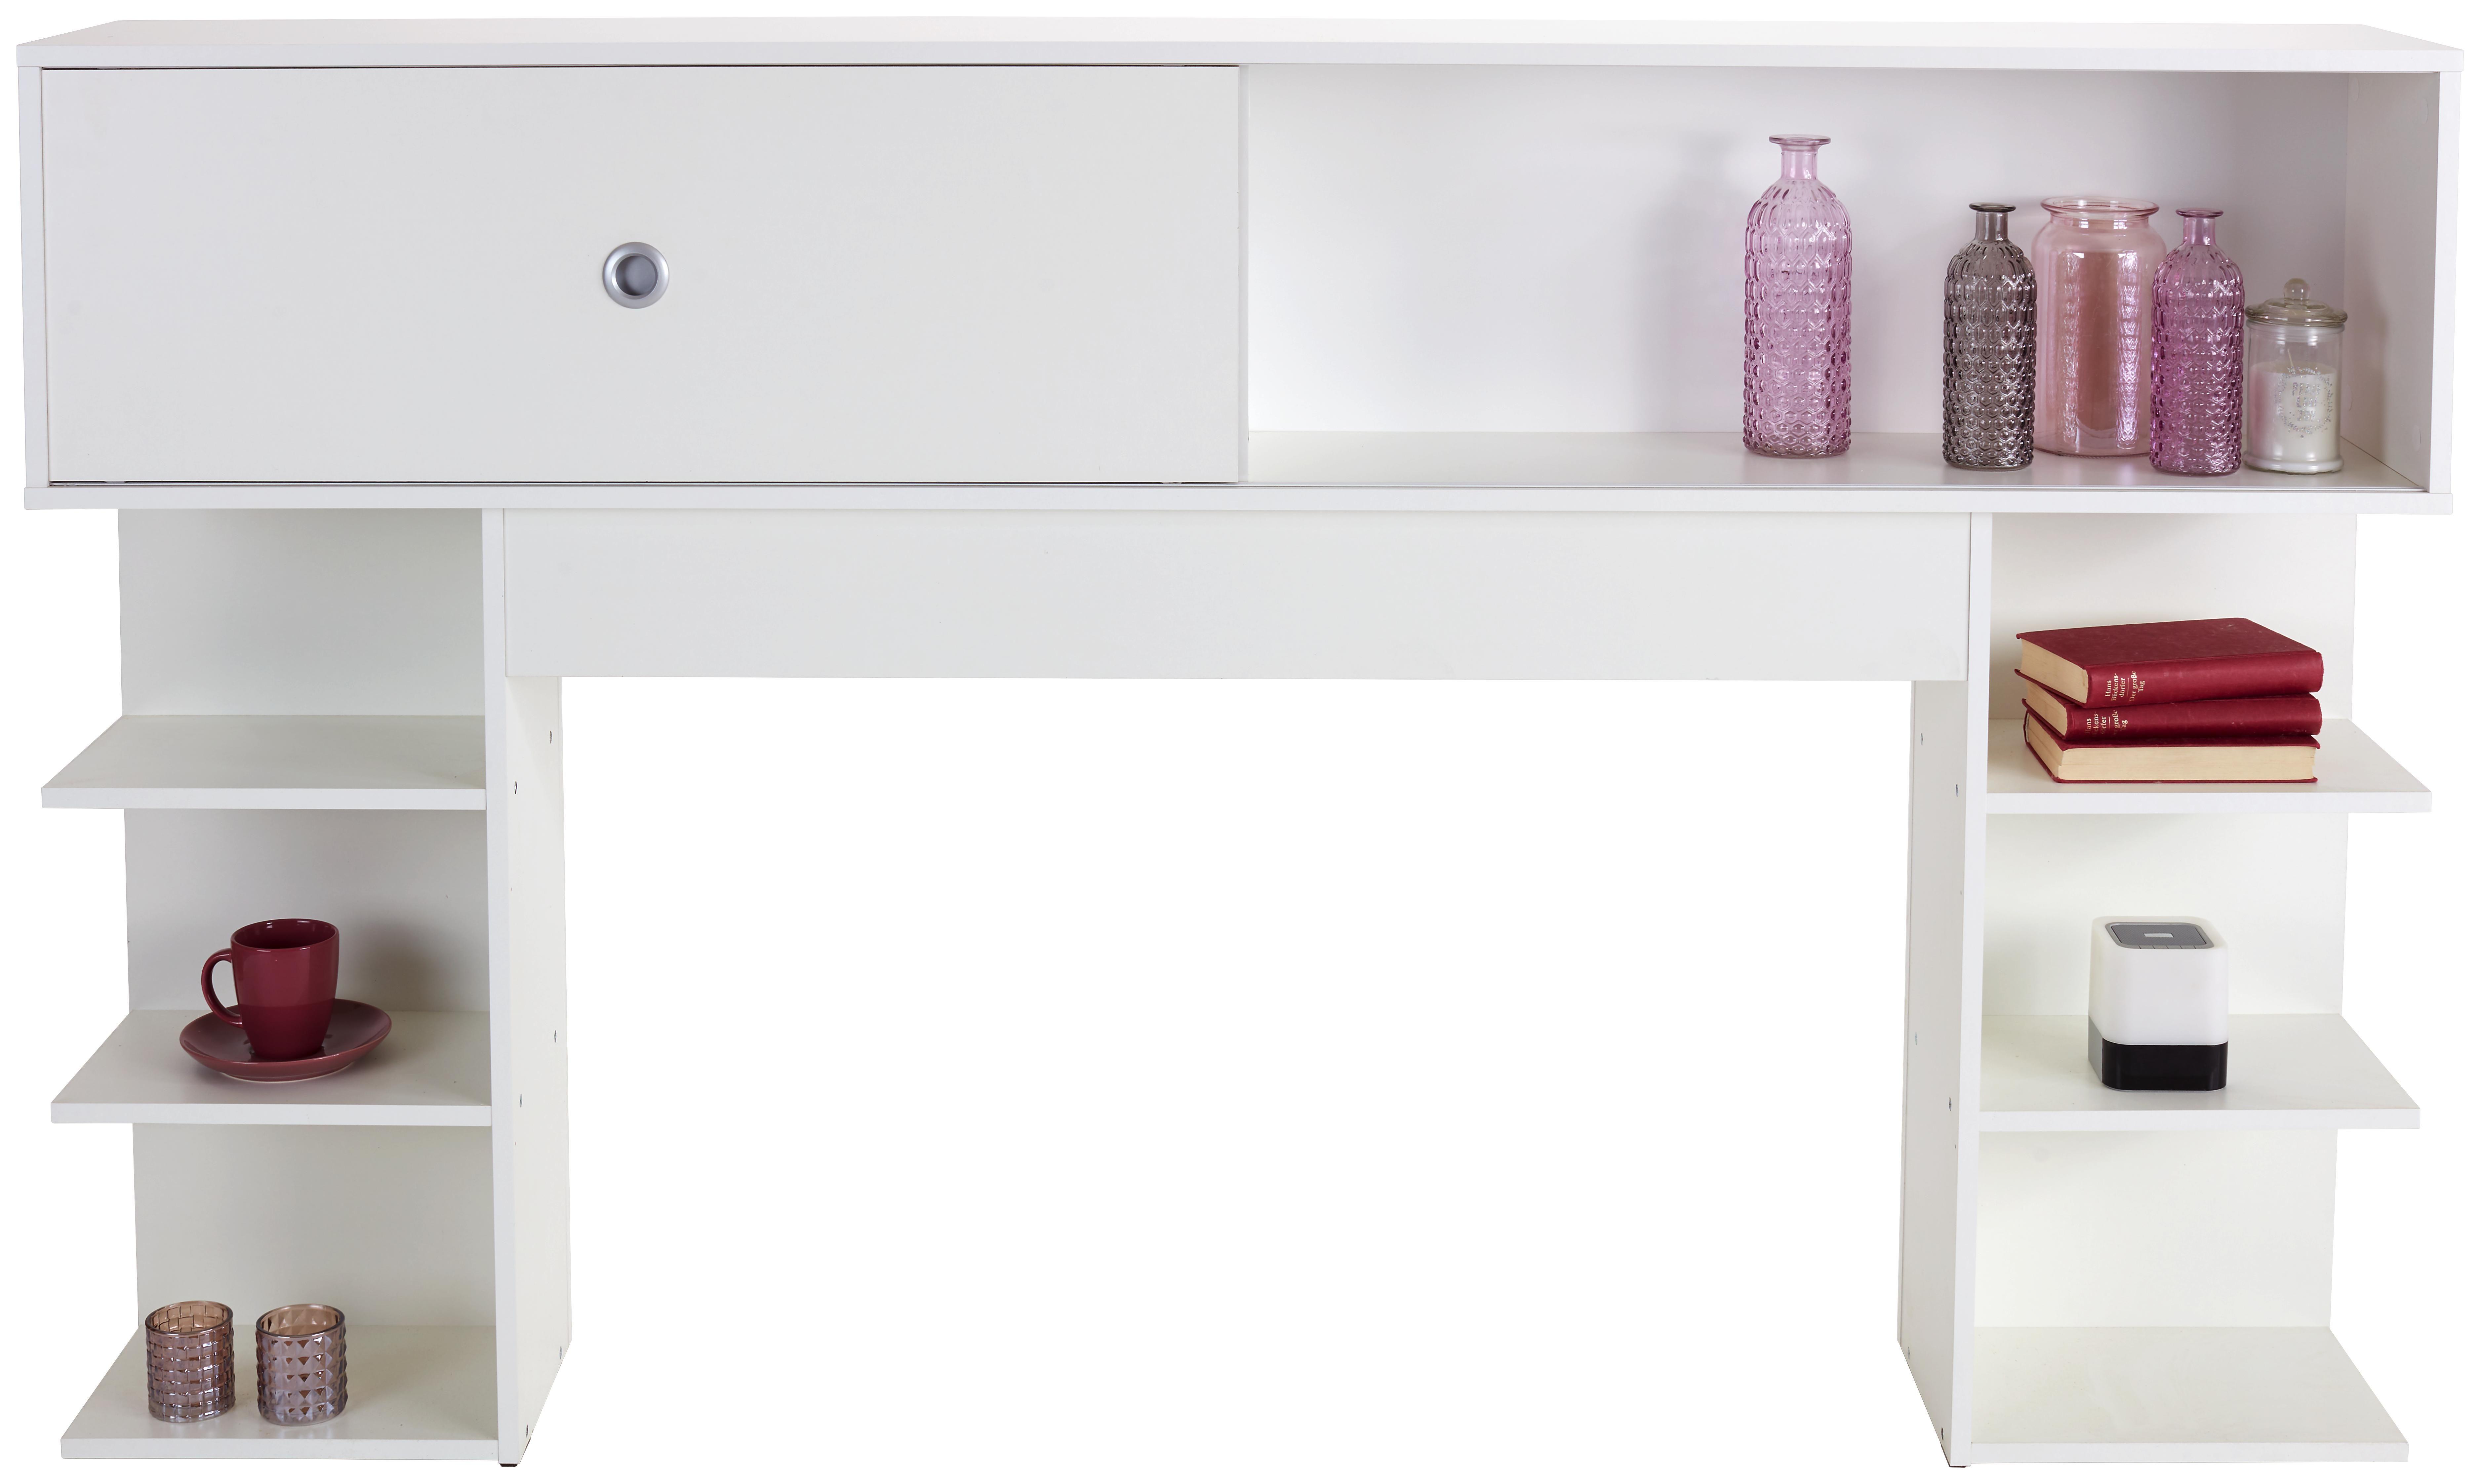 Omara Nad Posteljo Azurro 180 - aluminij/bela, Konvencionalno, umetna masa/leseni material (185/111/27cm) - Mömax modern living